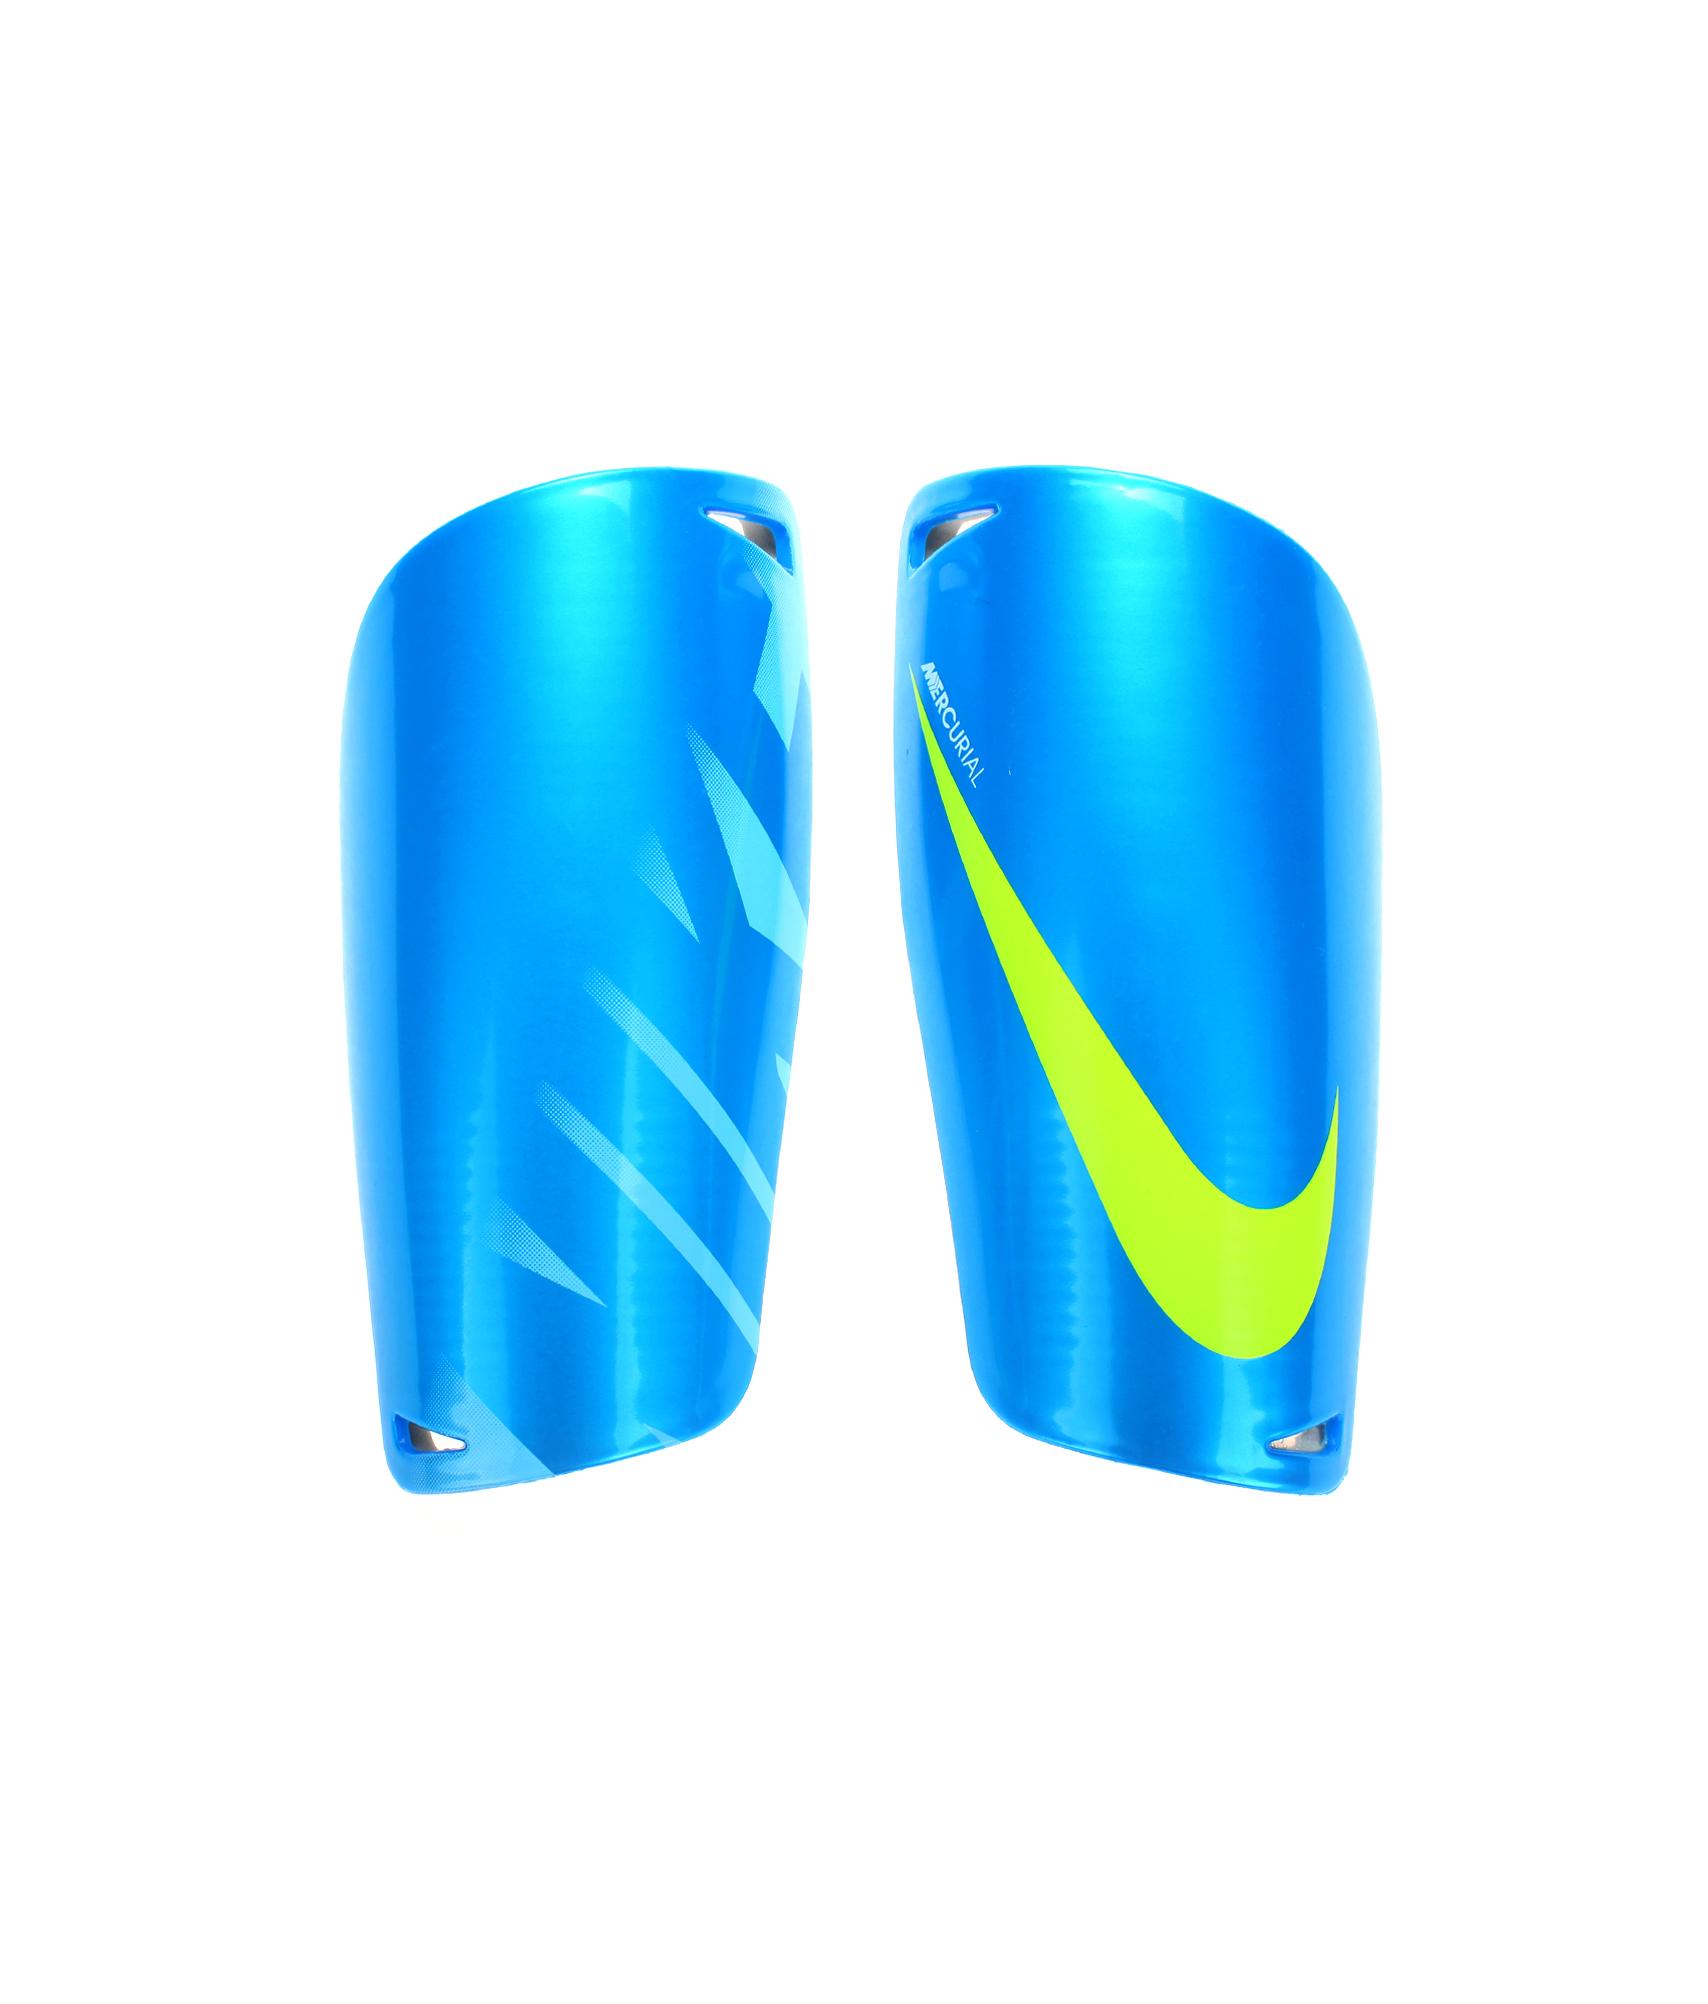 Щитки Nike MERCURIAL LITE, Цвет-Голубой, Размер-L